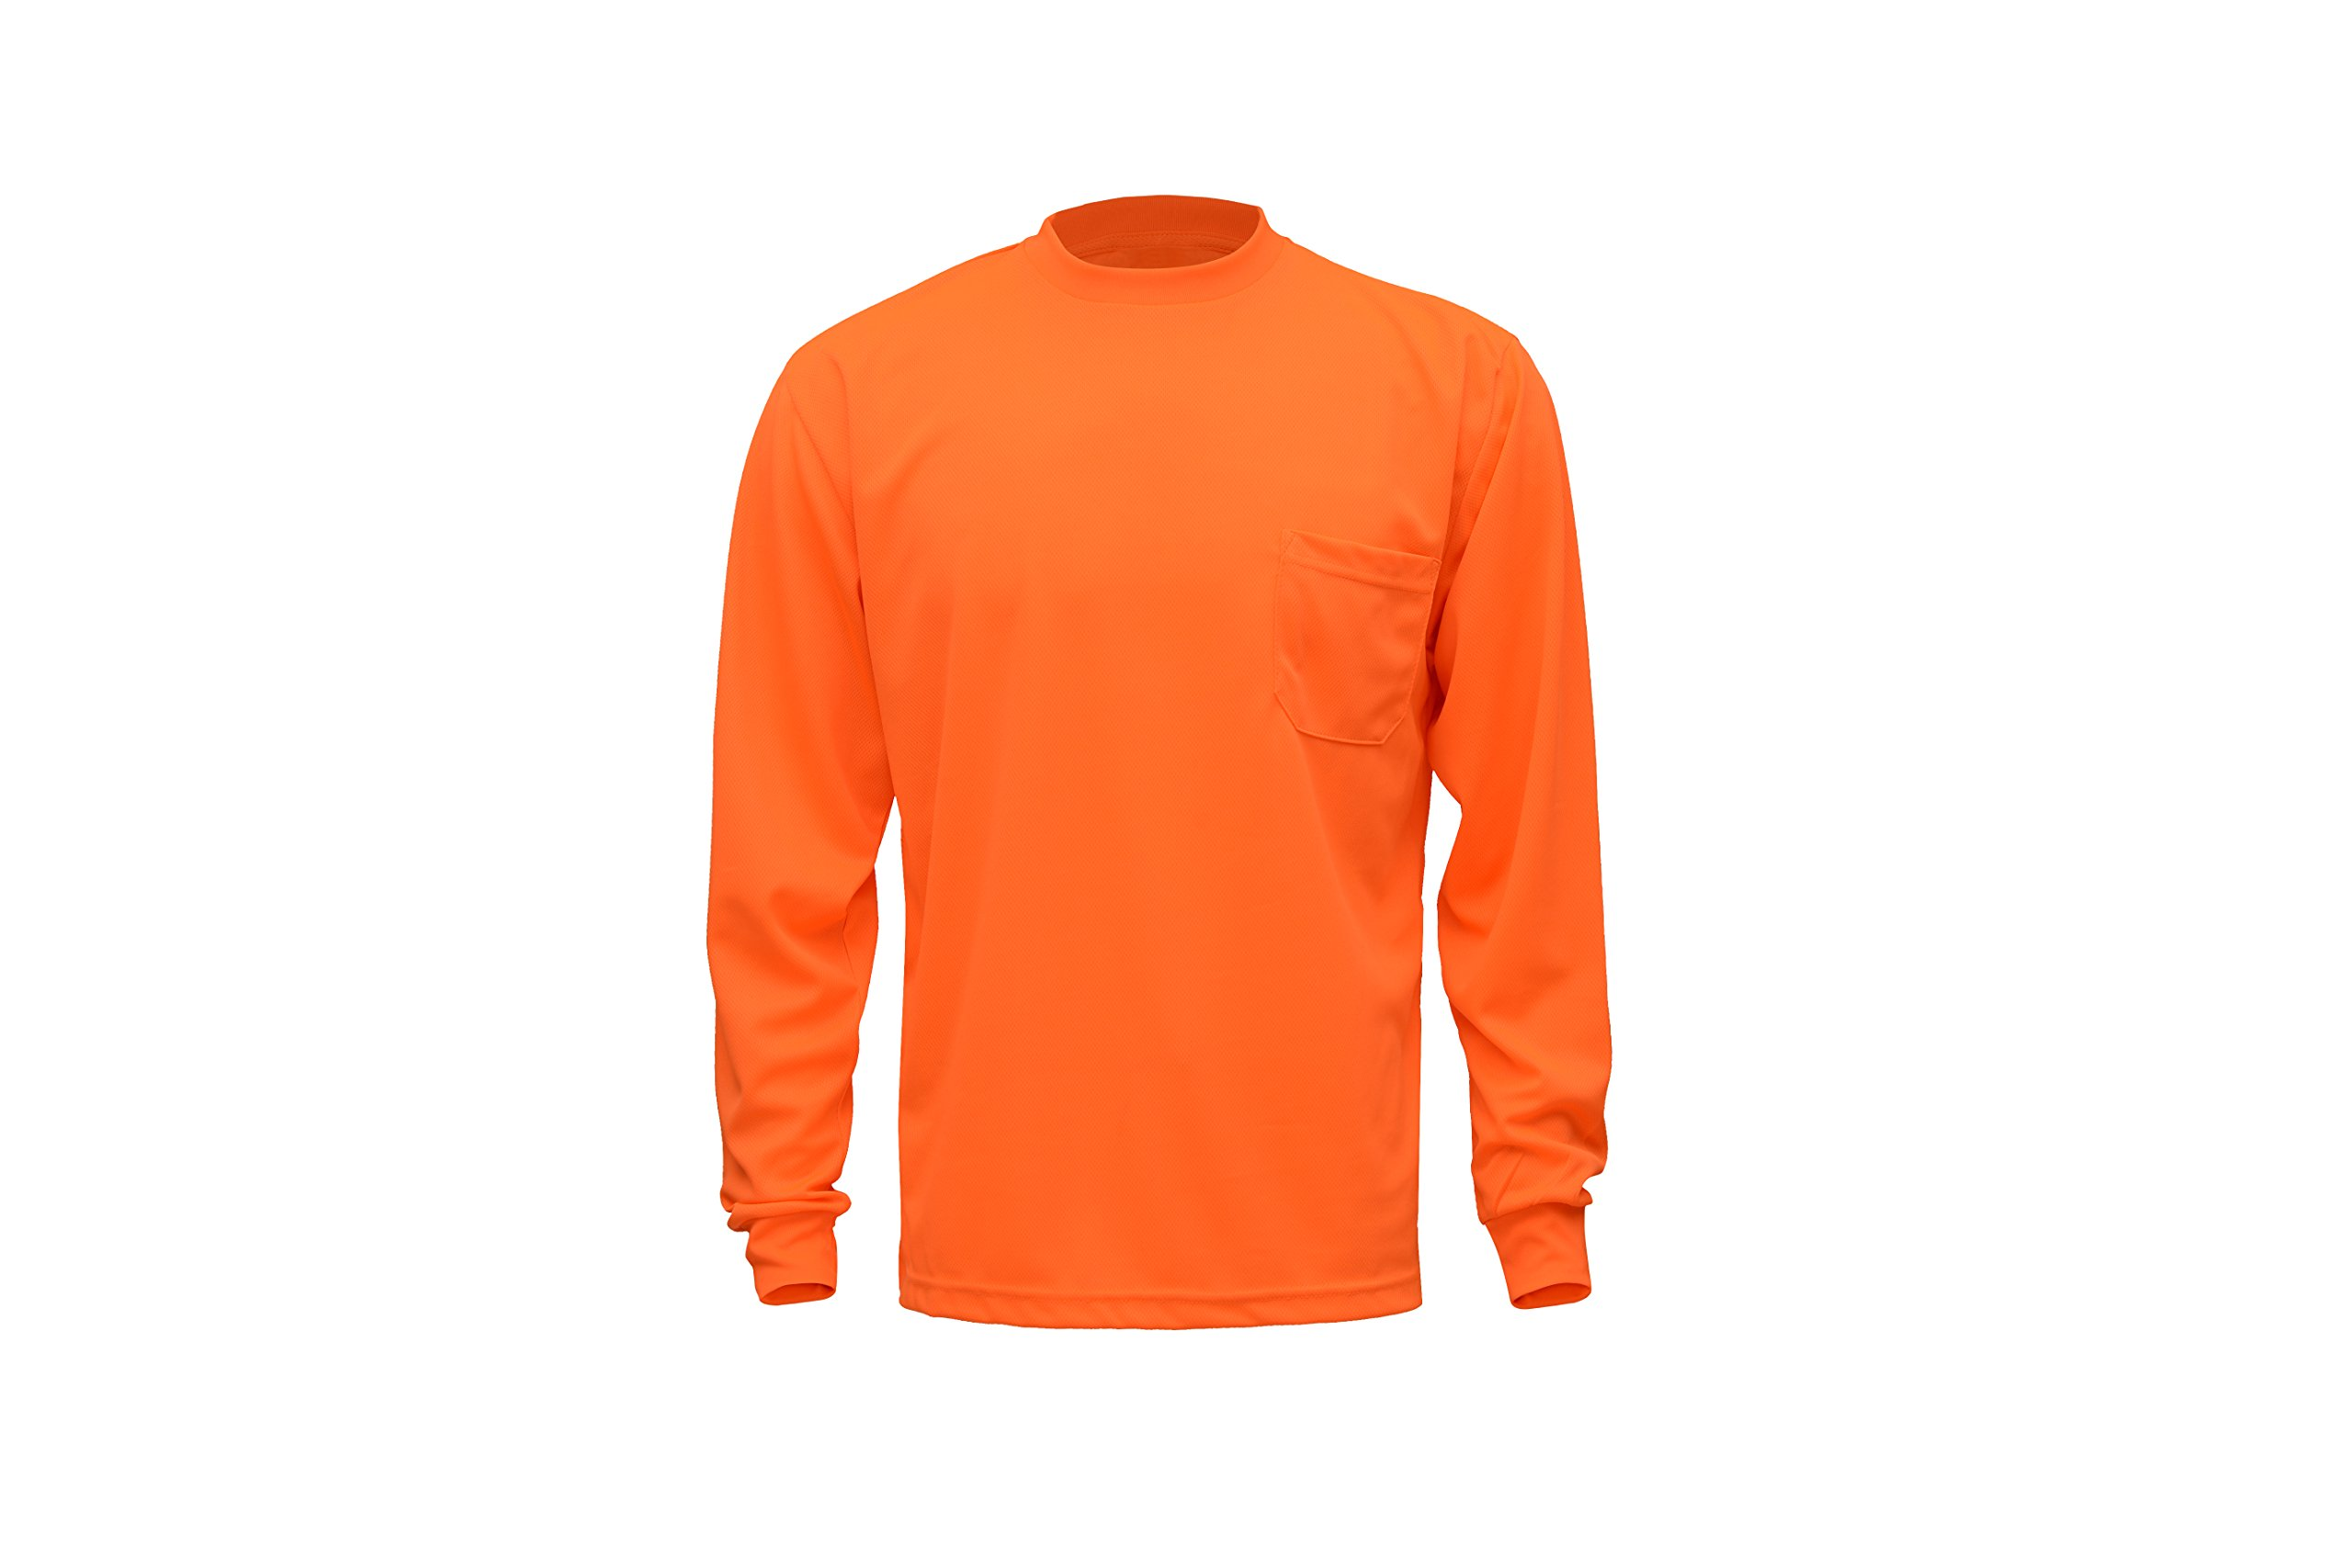 CJ Safety CJHVTS0002 High Vis Long Sleeve Safety Shirt   Moisture Wicking Birdseye Mesh   Chest Pocket (2XL, Orange)